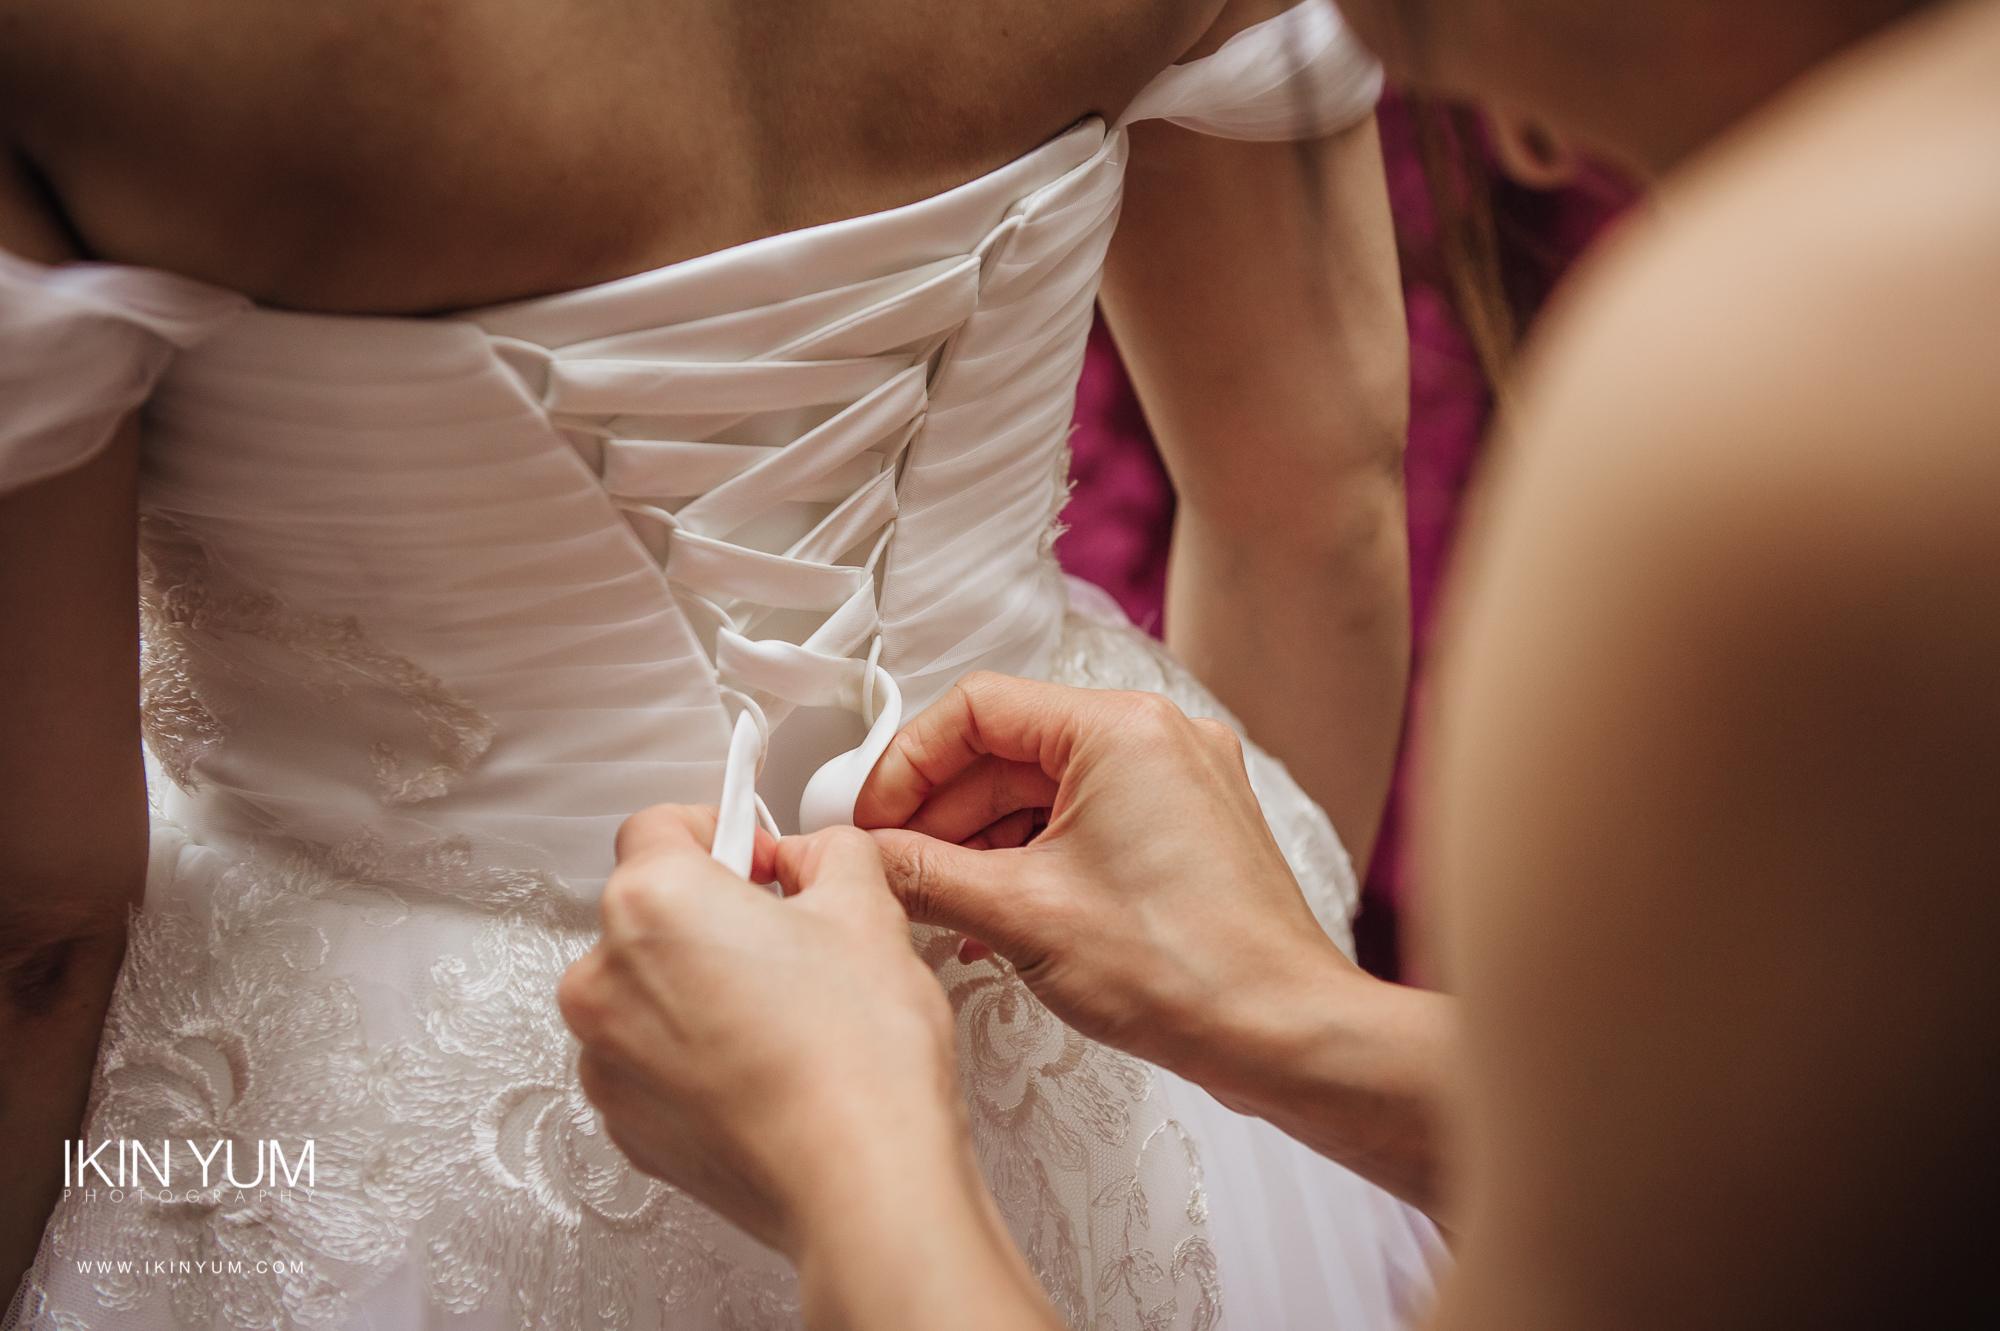 Hampton Manor Wedding - Ikin Yum Photography -053.jpg